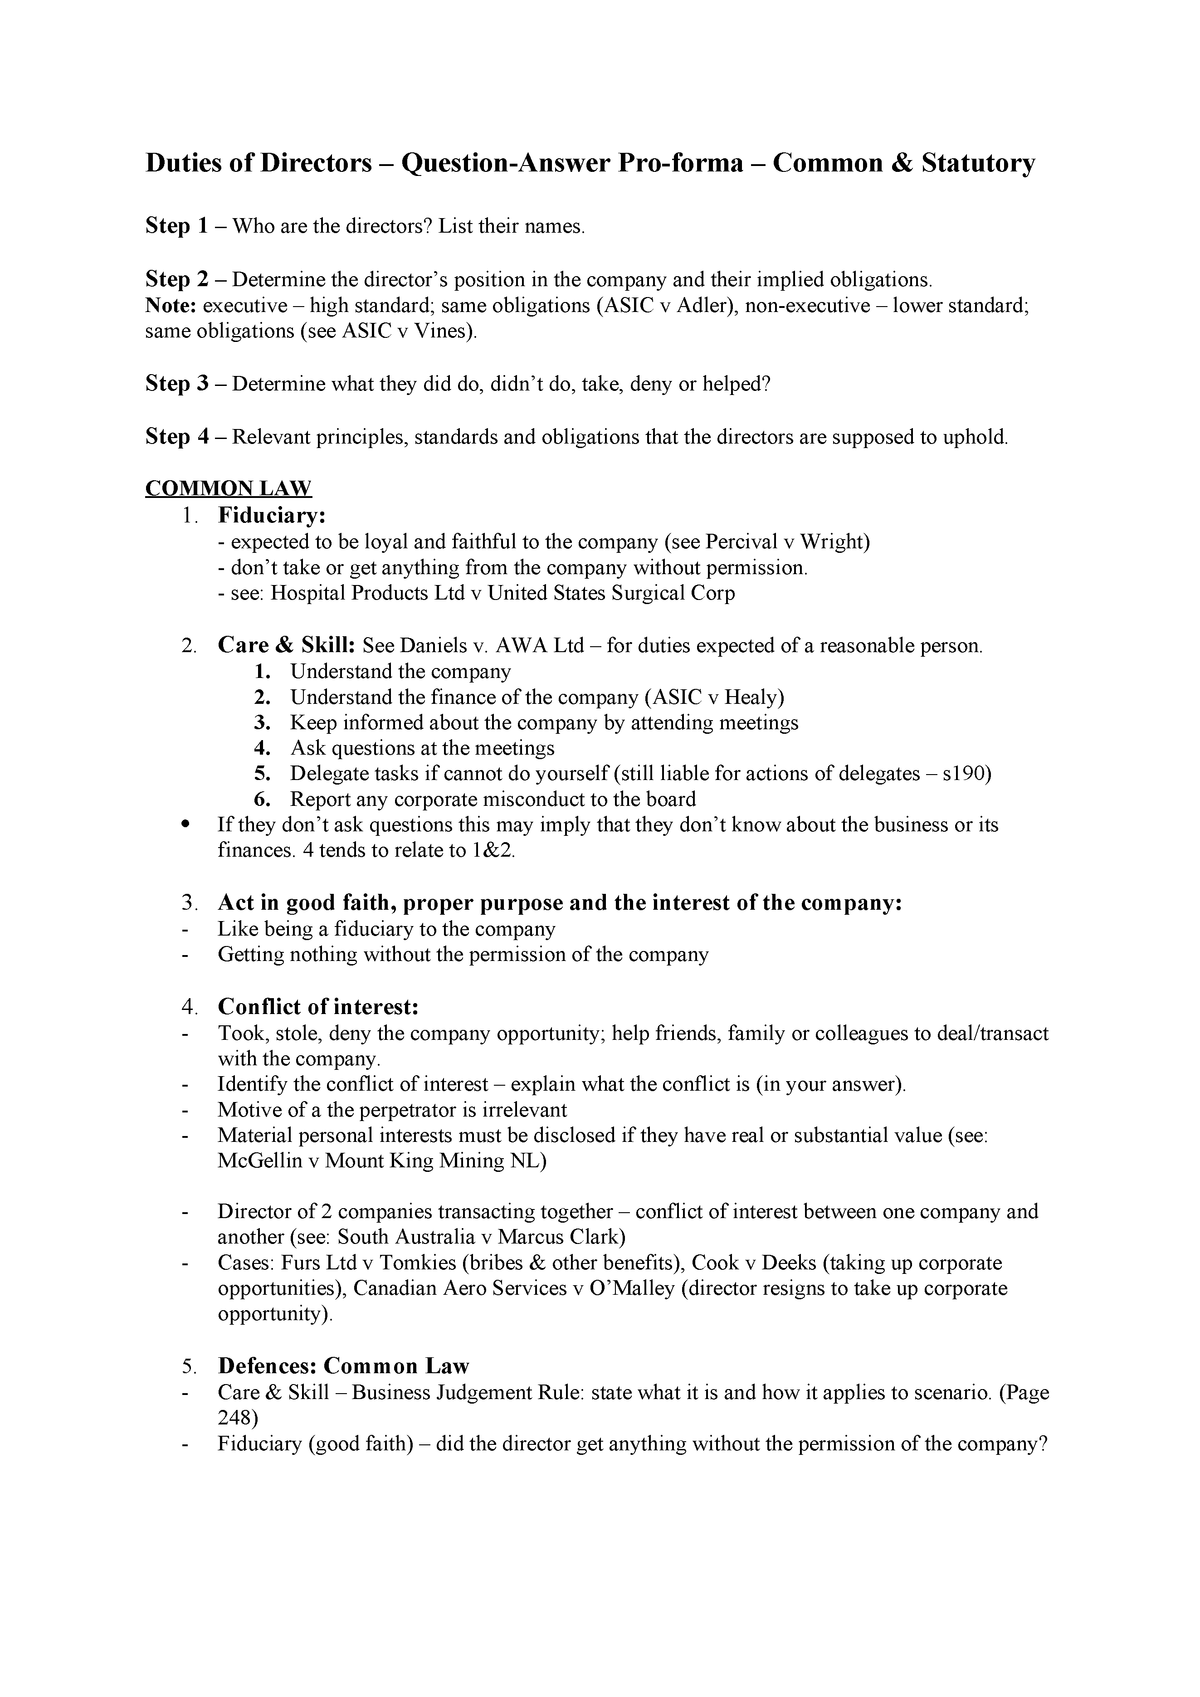 Duties of Directors - Exam Notes - Company Law LAW2450 - StuDocu